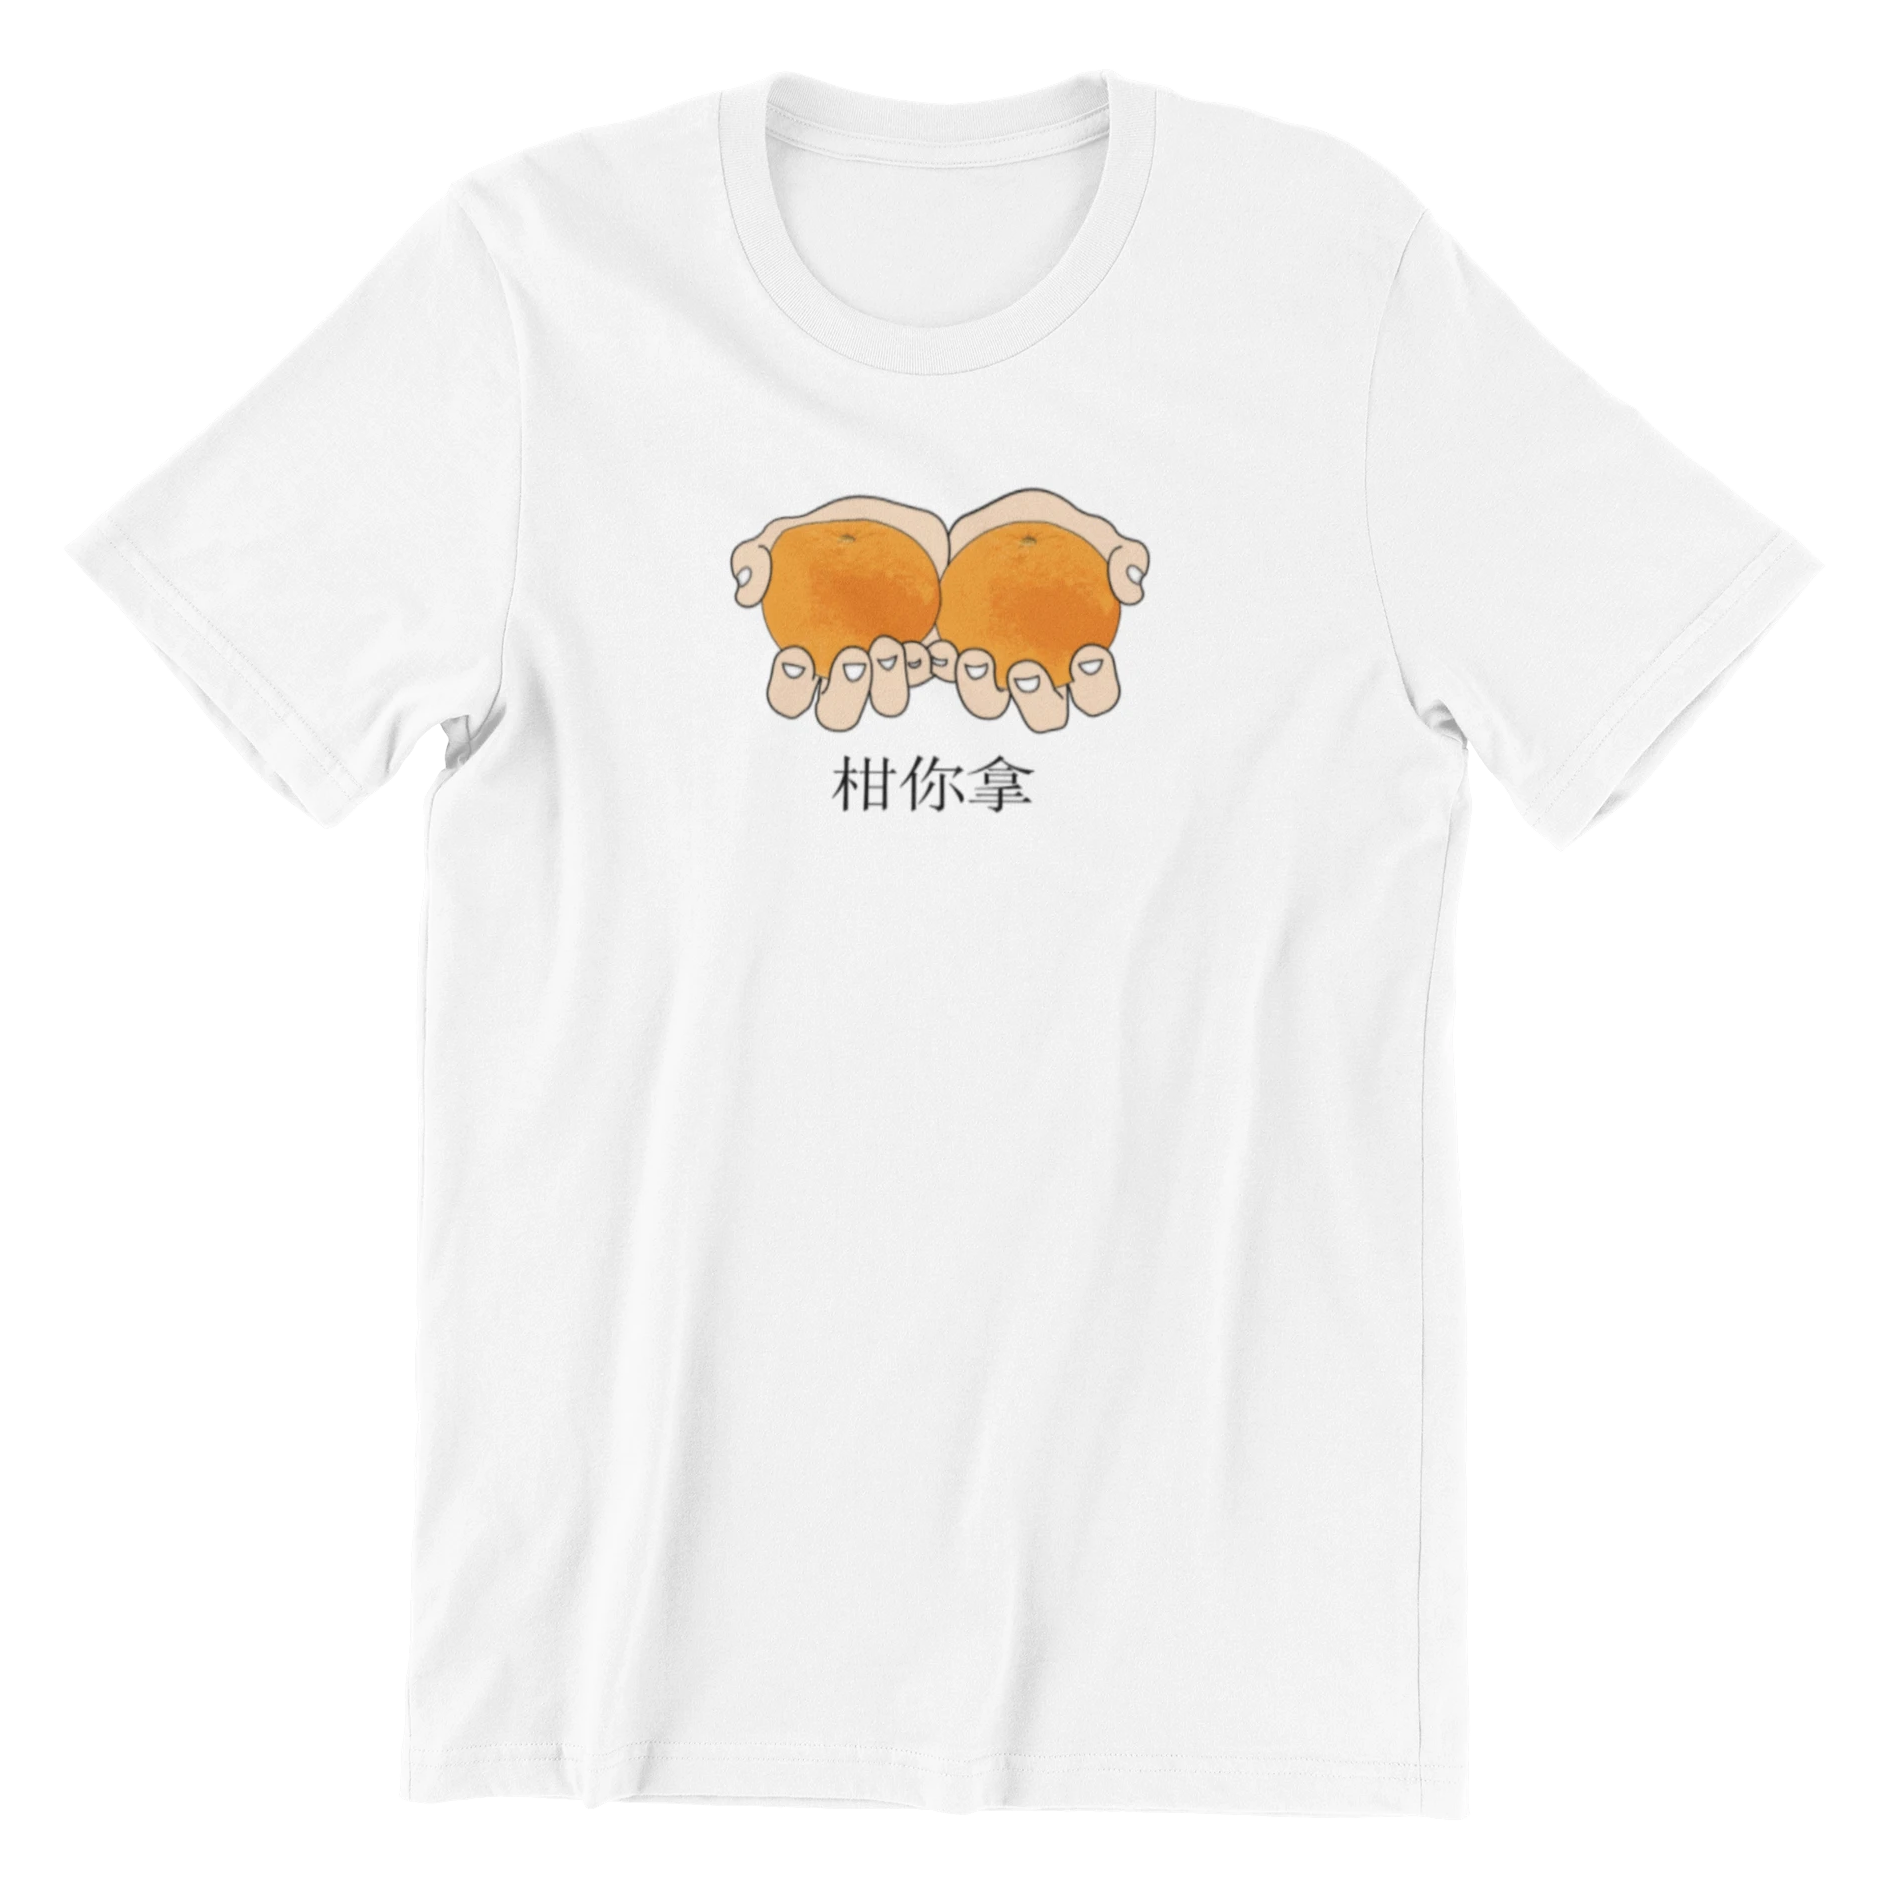 Take The Oranges Crew Neck S-Sleeve T-shirt